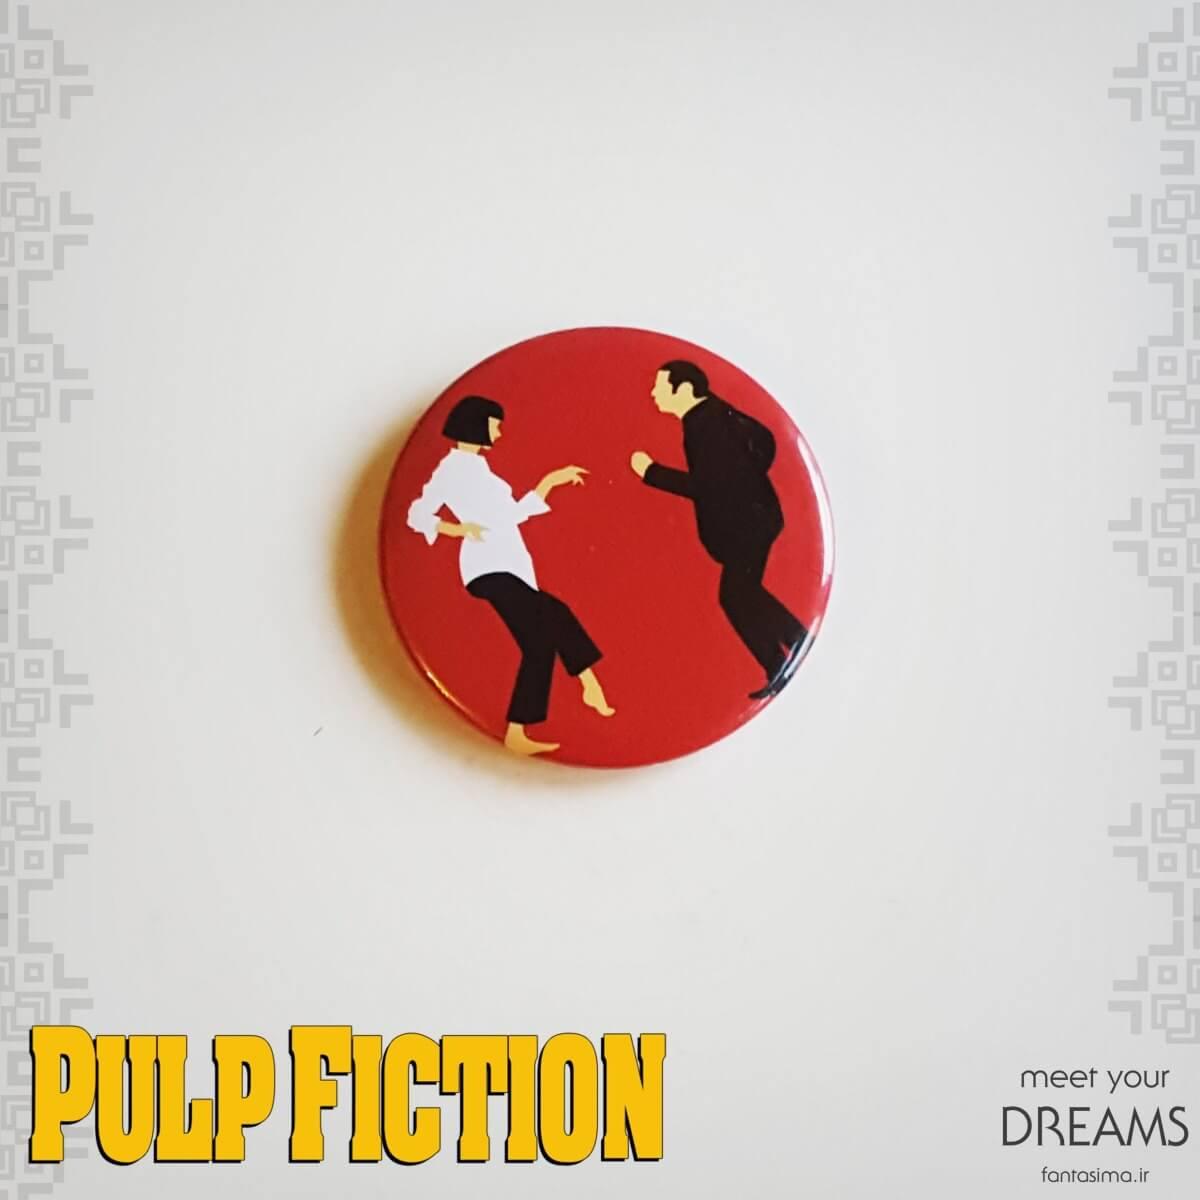 پیکسل فلزی pulp fiction